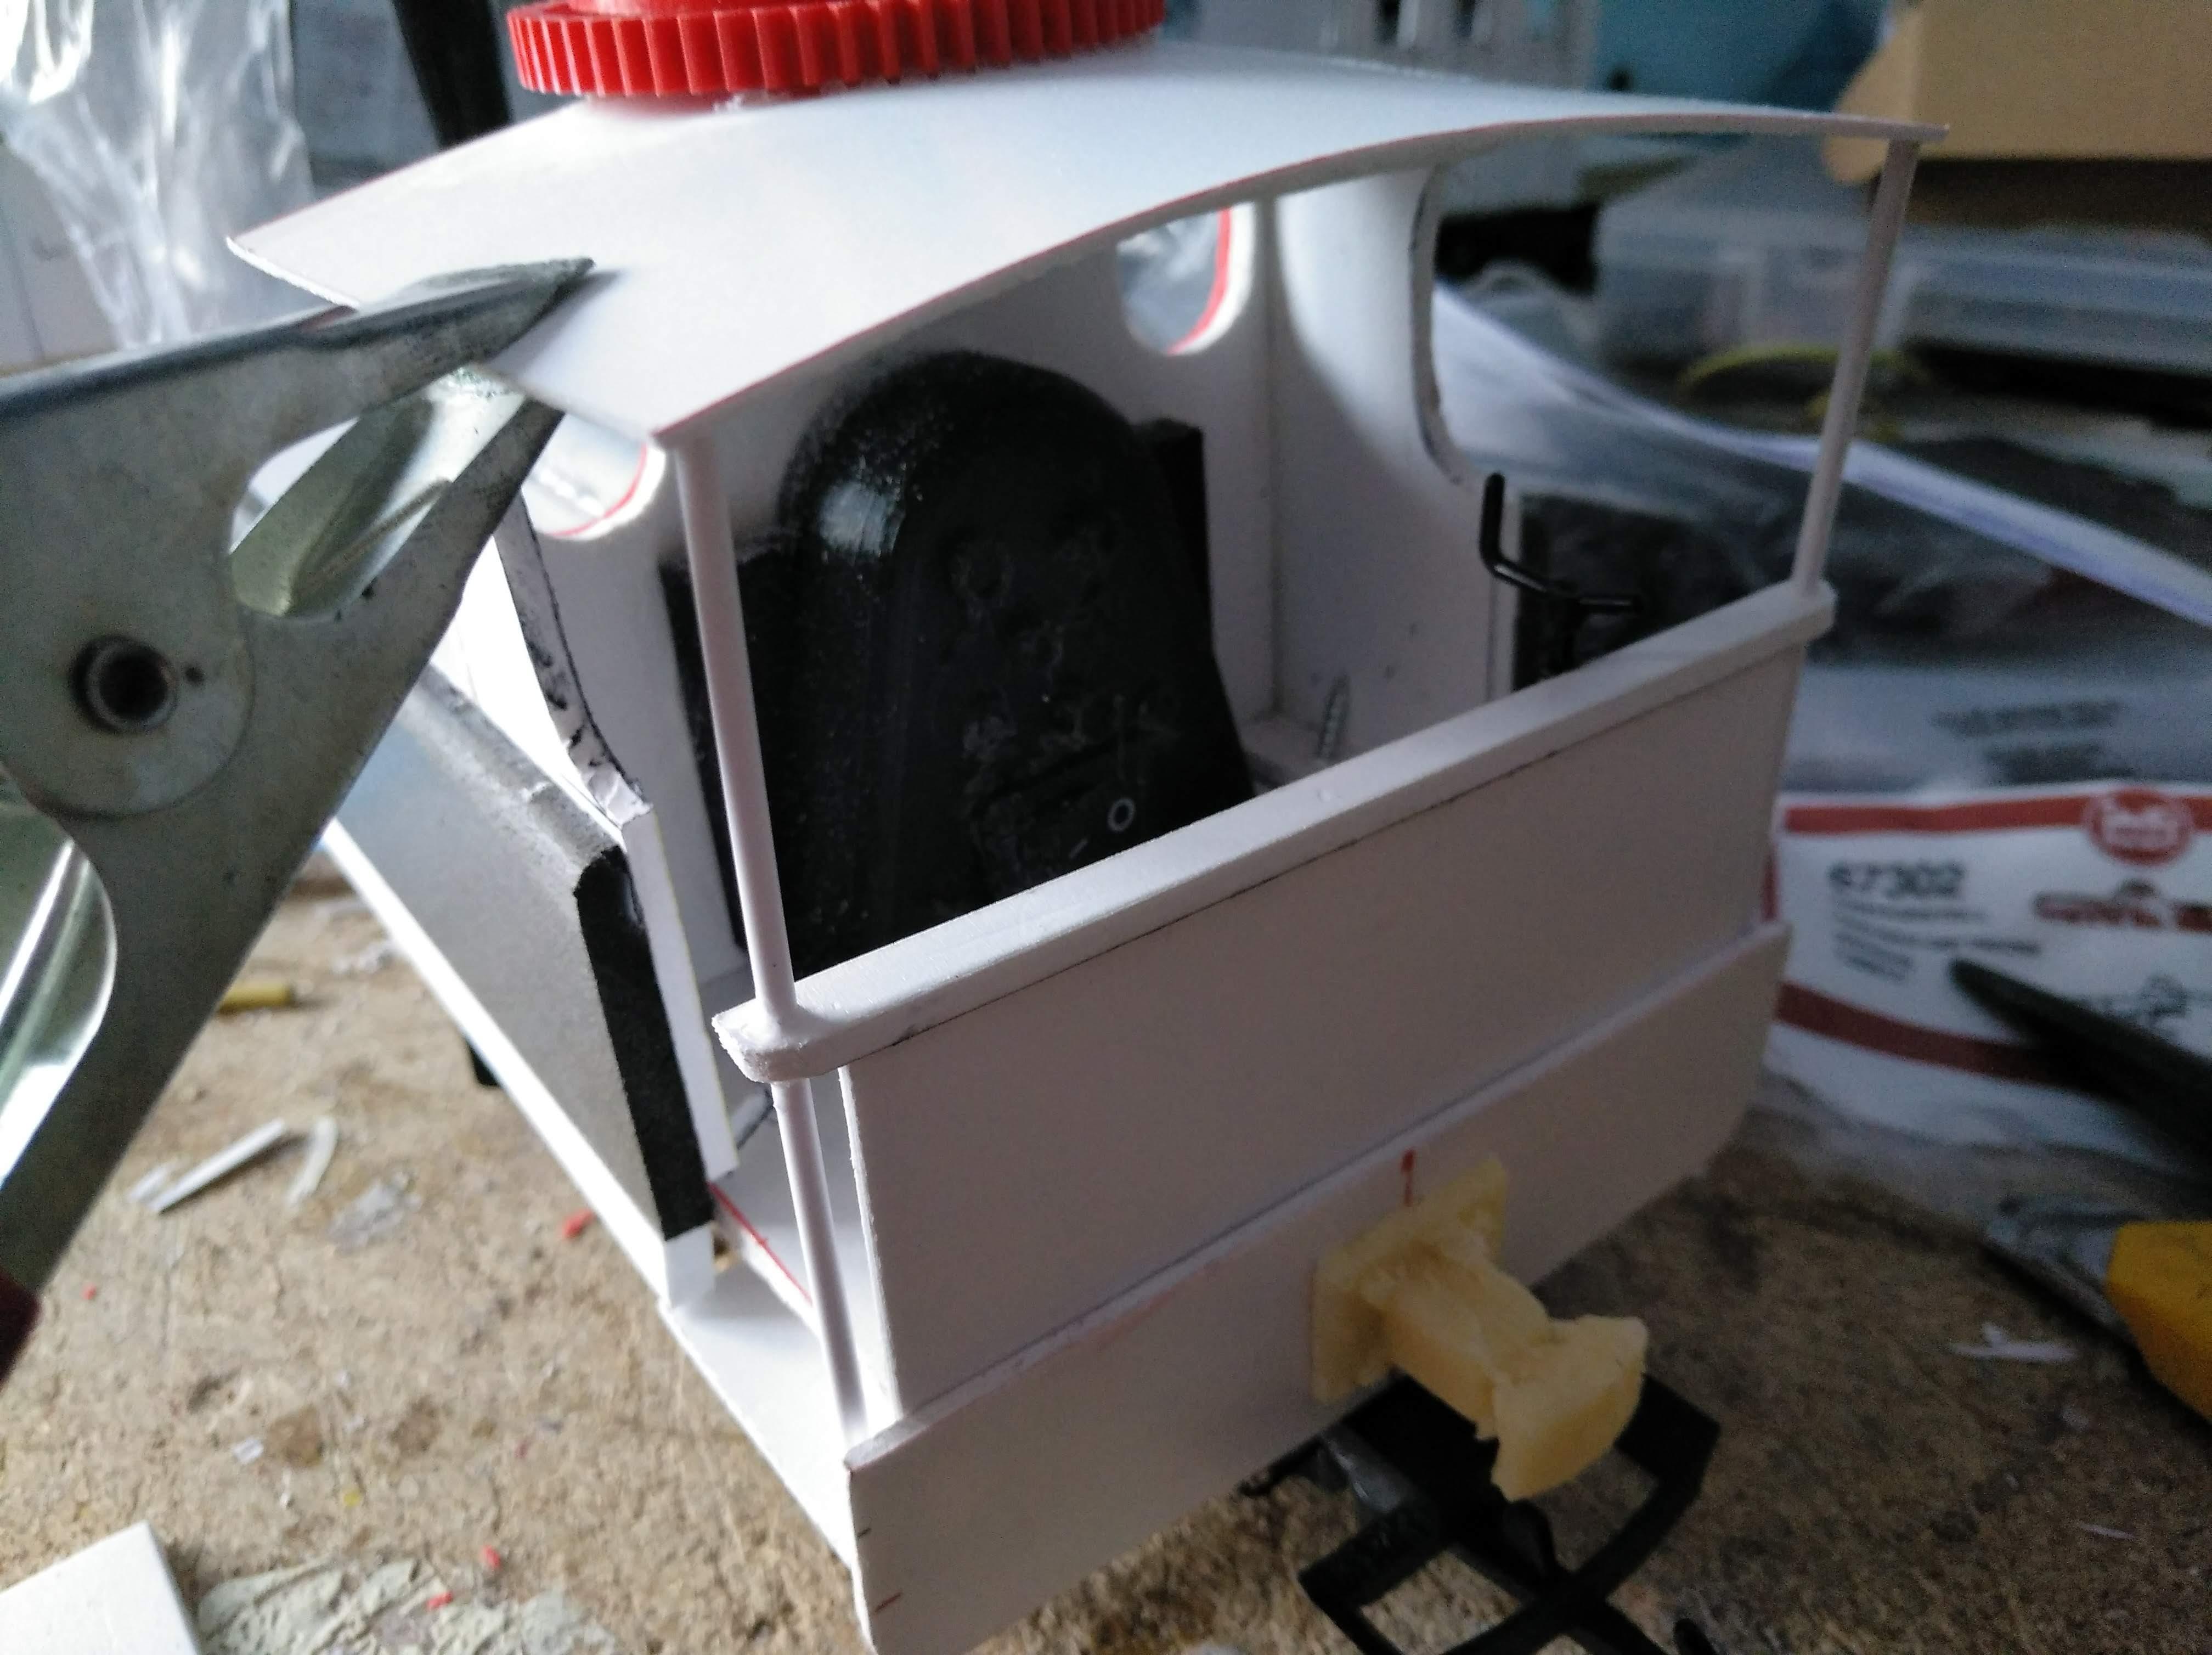 locomotora grua RT 150 - Página 2 Img_2420